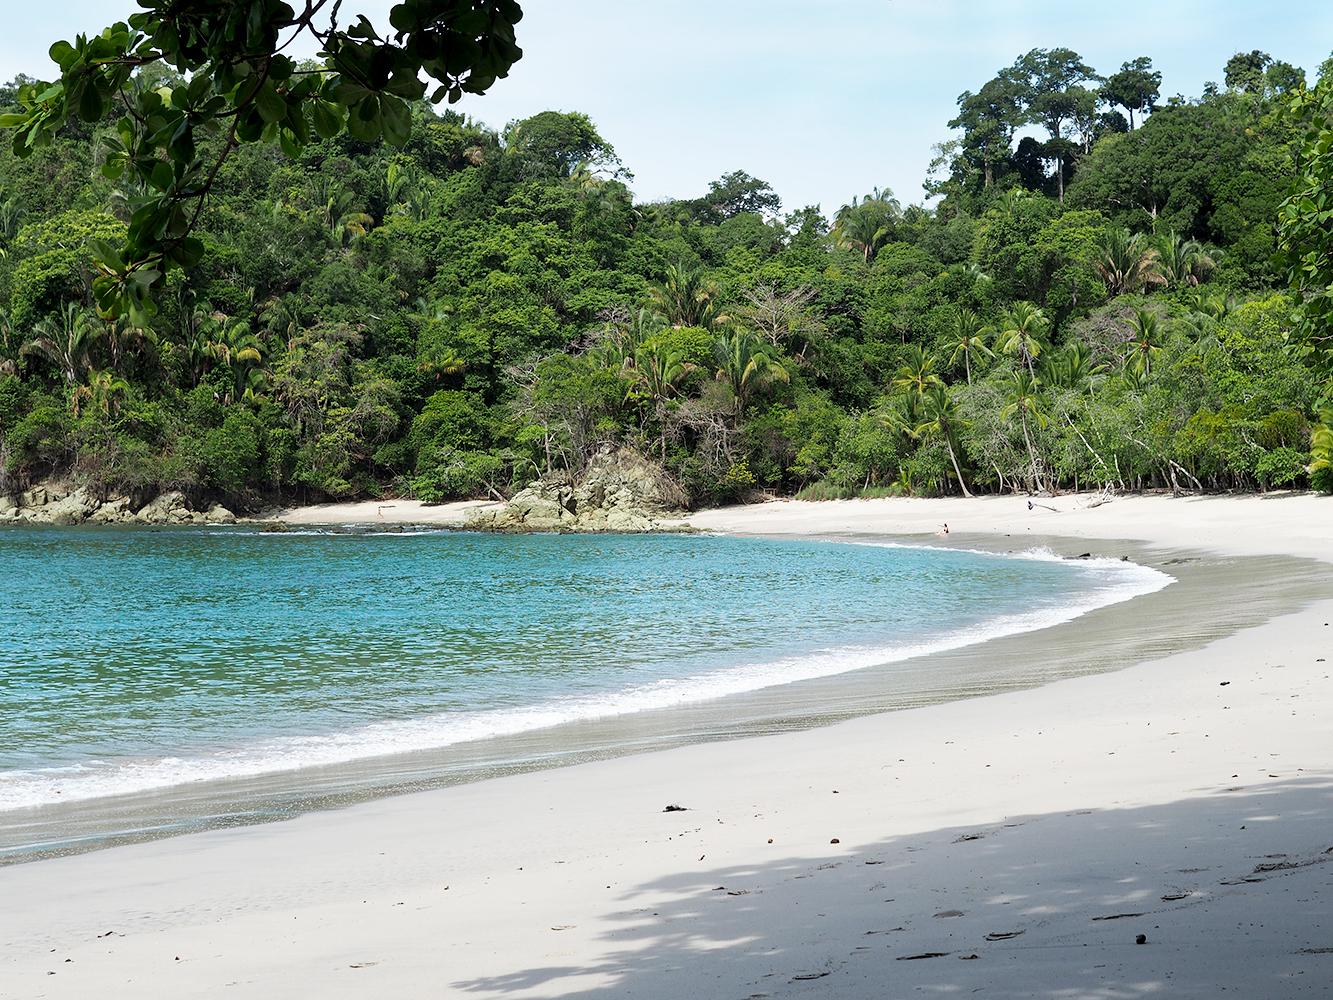 Pura Vida, Kostaryka – Ameryka Środkowa